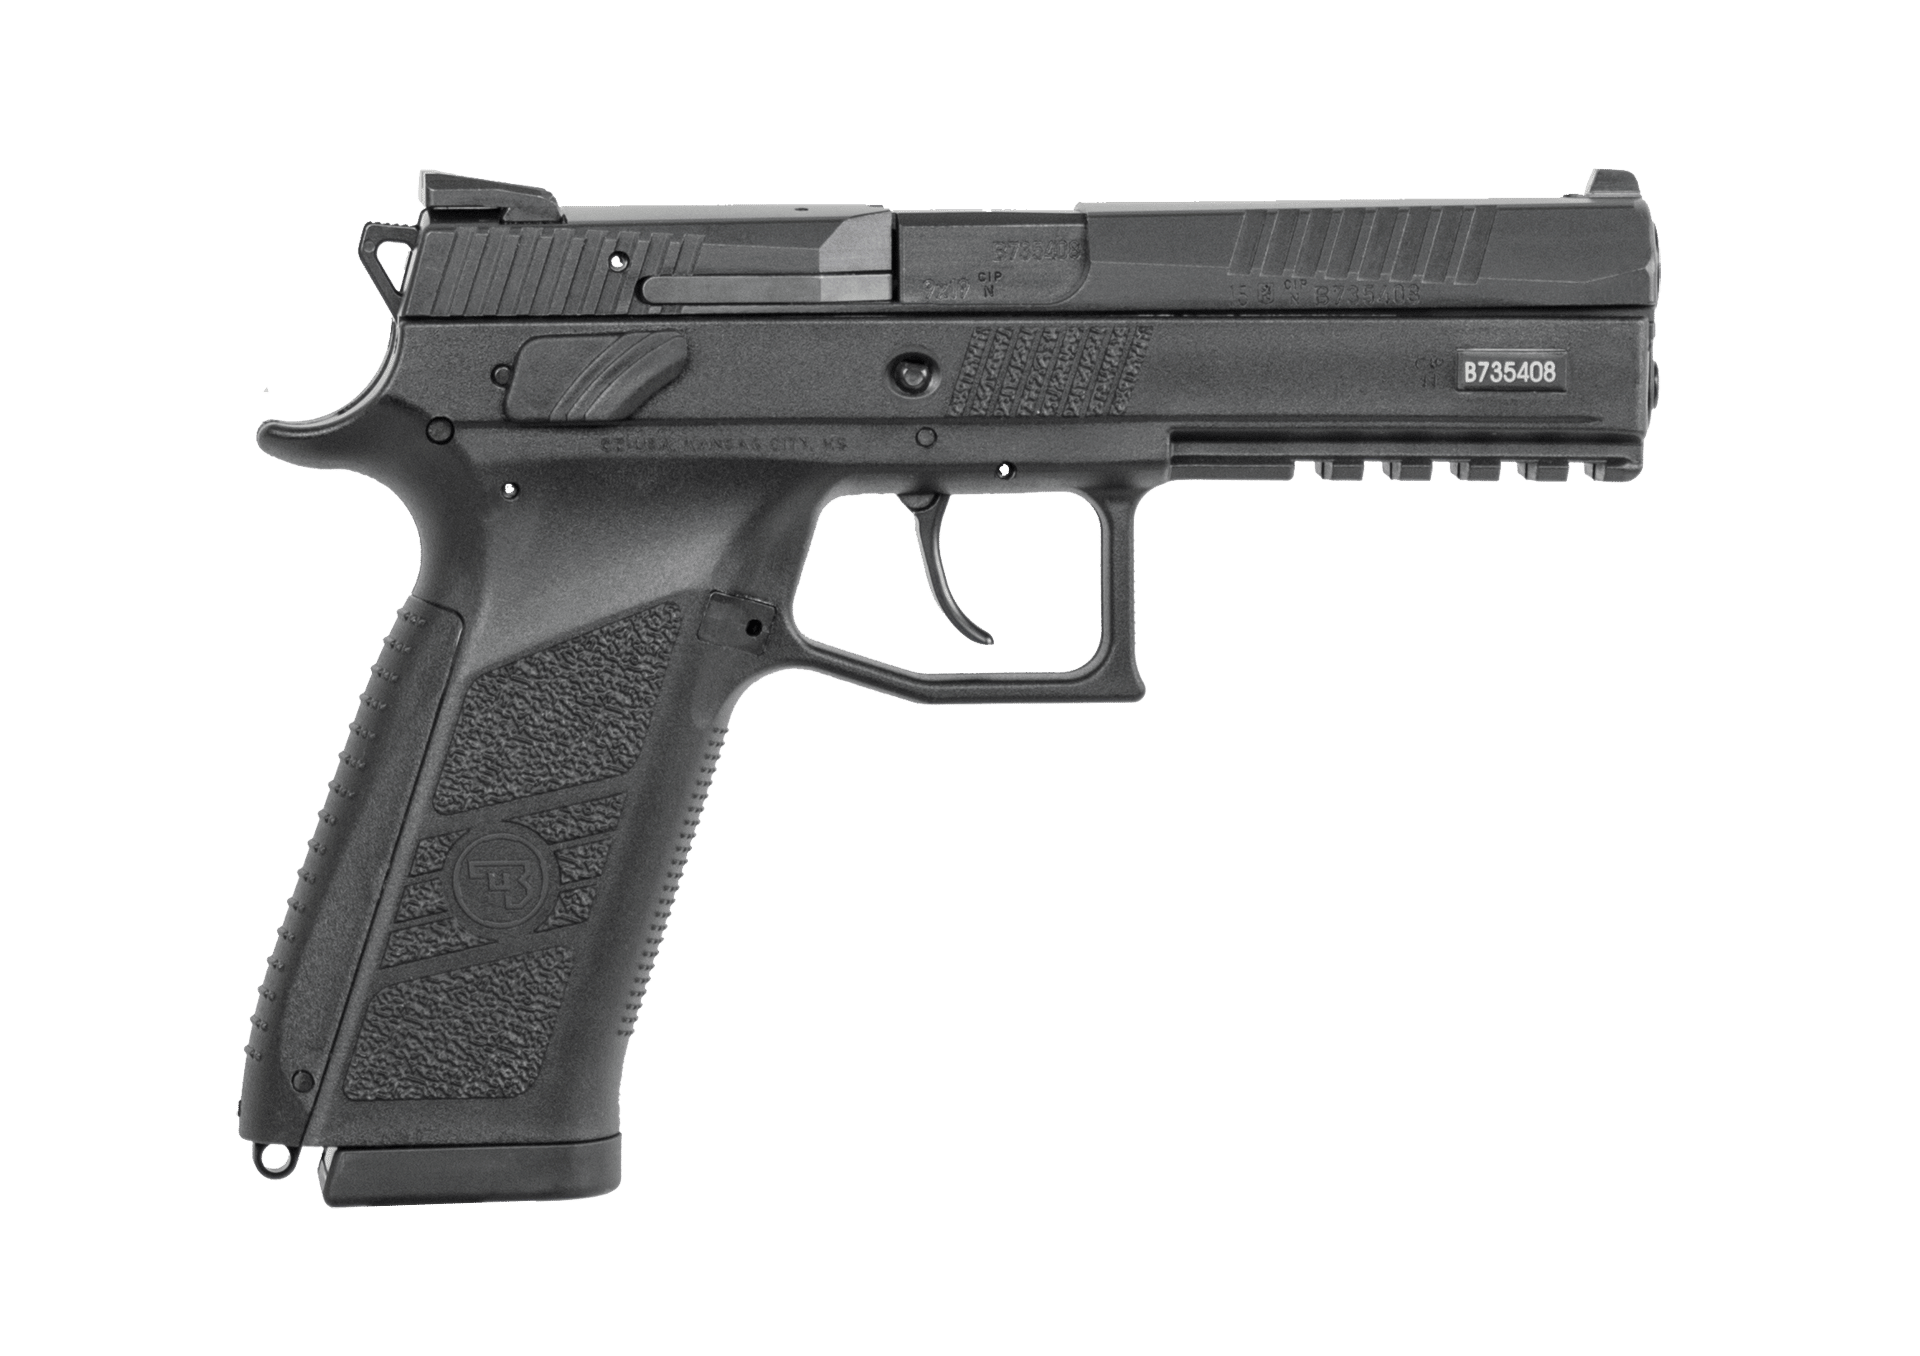 Shot clipart rifle shooting. Gun firearm pistol range